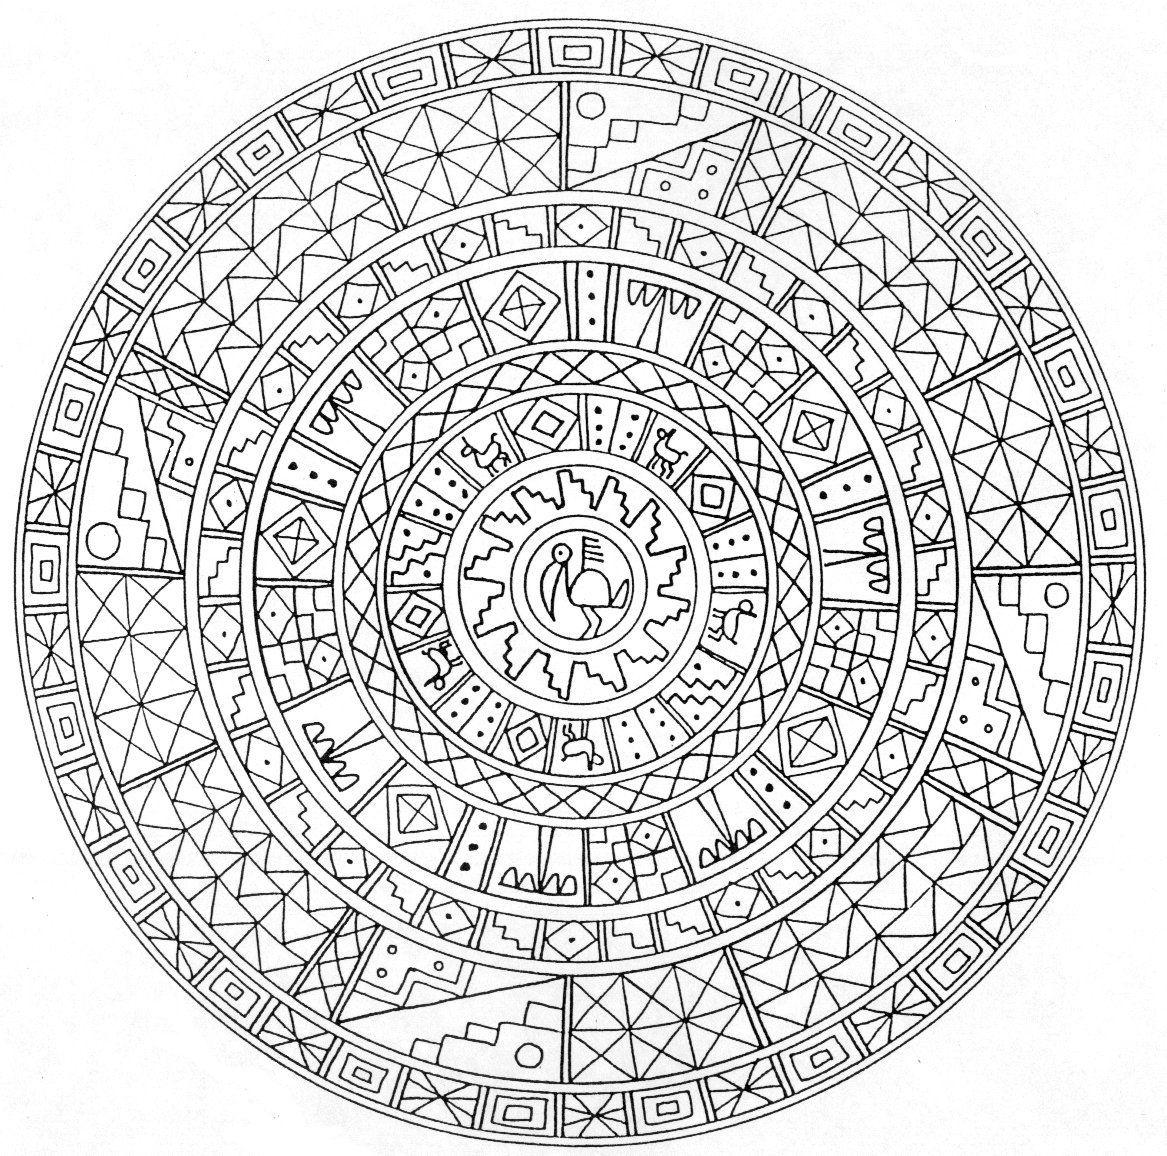 Dibujos Para Imprimir Mandalas Dificiles 2 Drawing